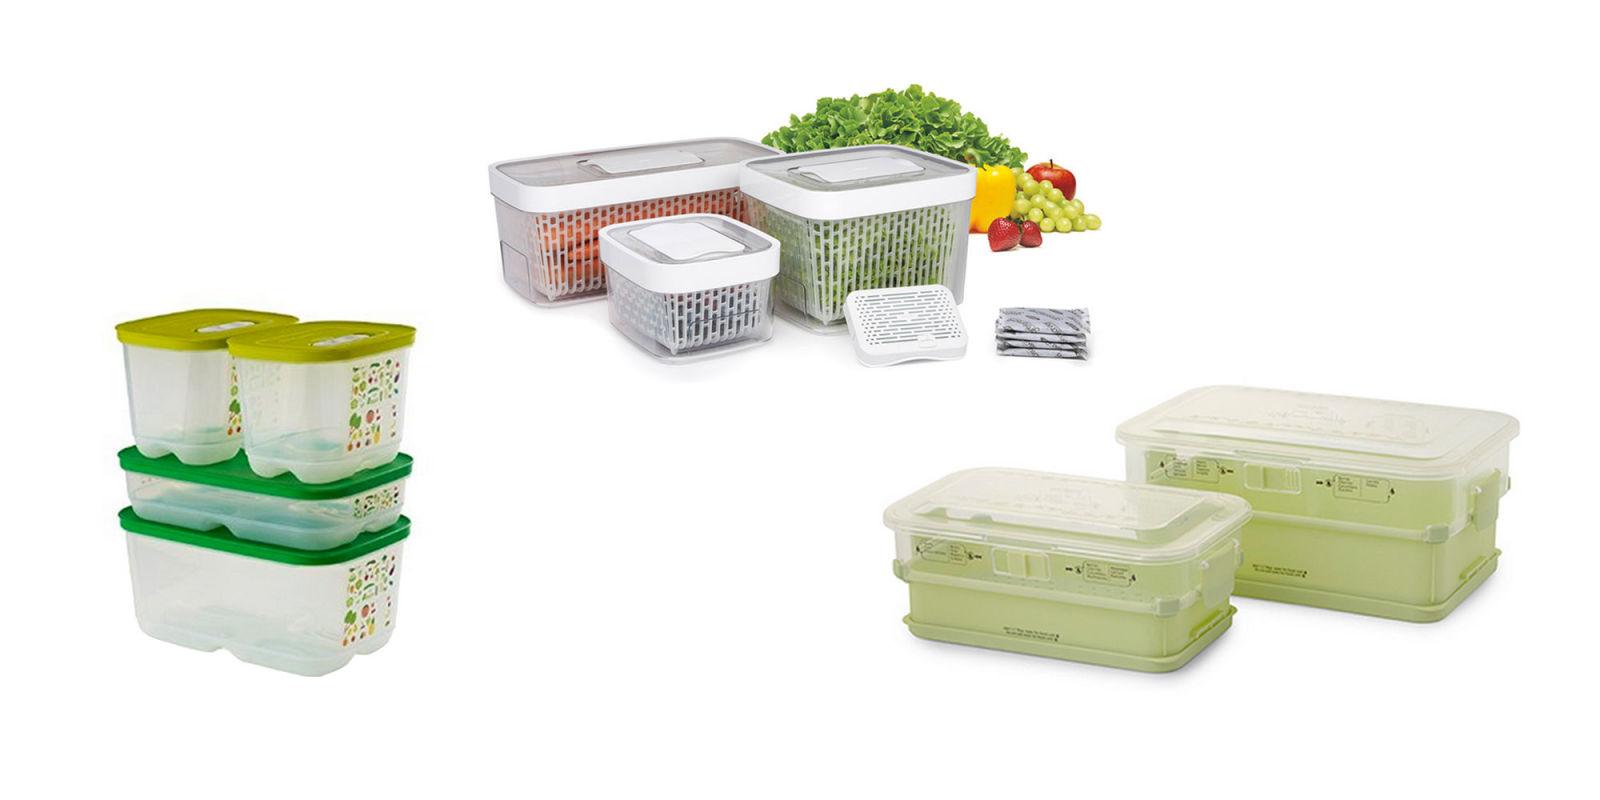 Produce Keeper Reviews   OXO GreenSaver Produce Keeper, Princess House  Fresh + Healthy Produce Keeper And Tupperware FridgeSmart